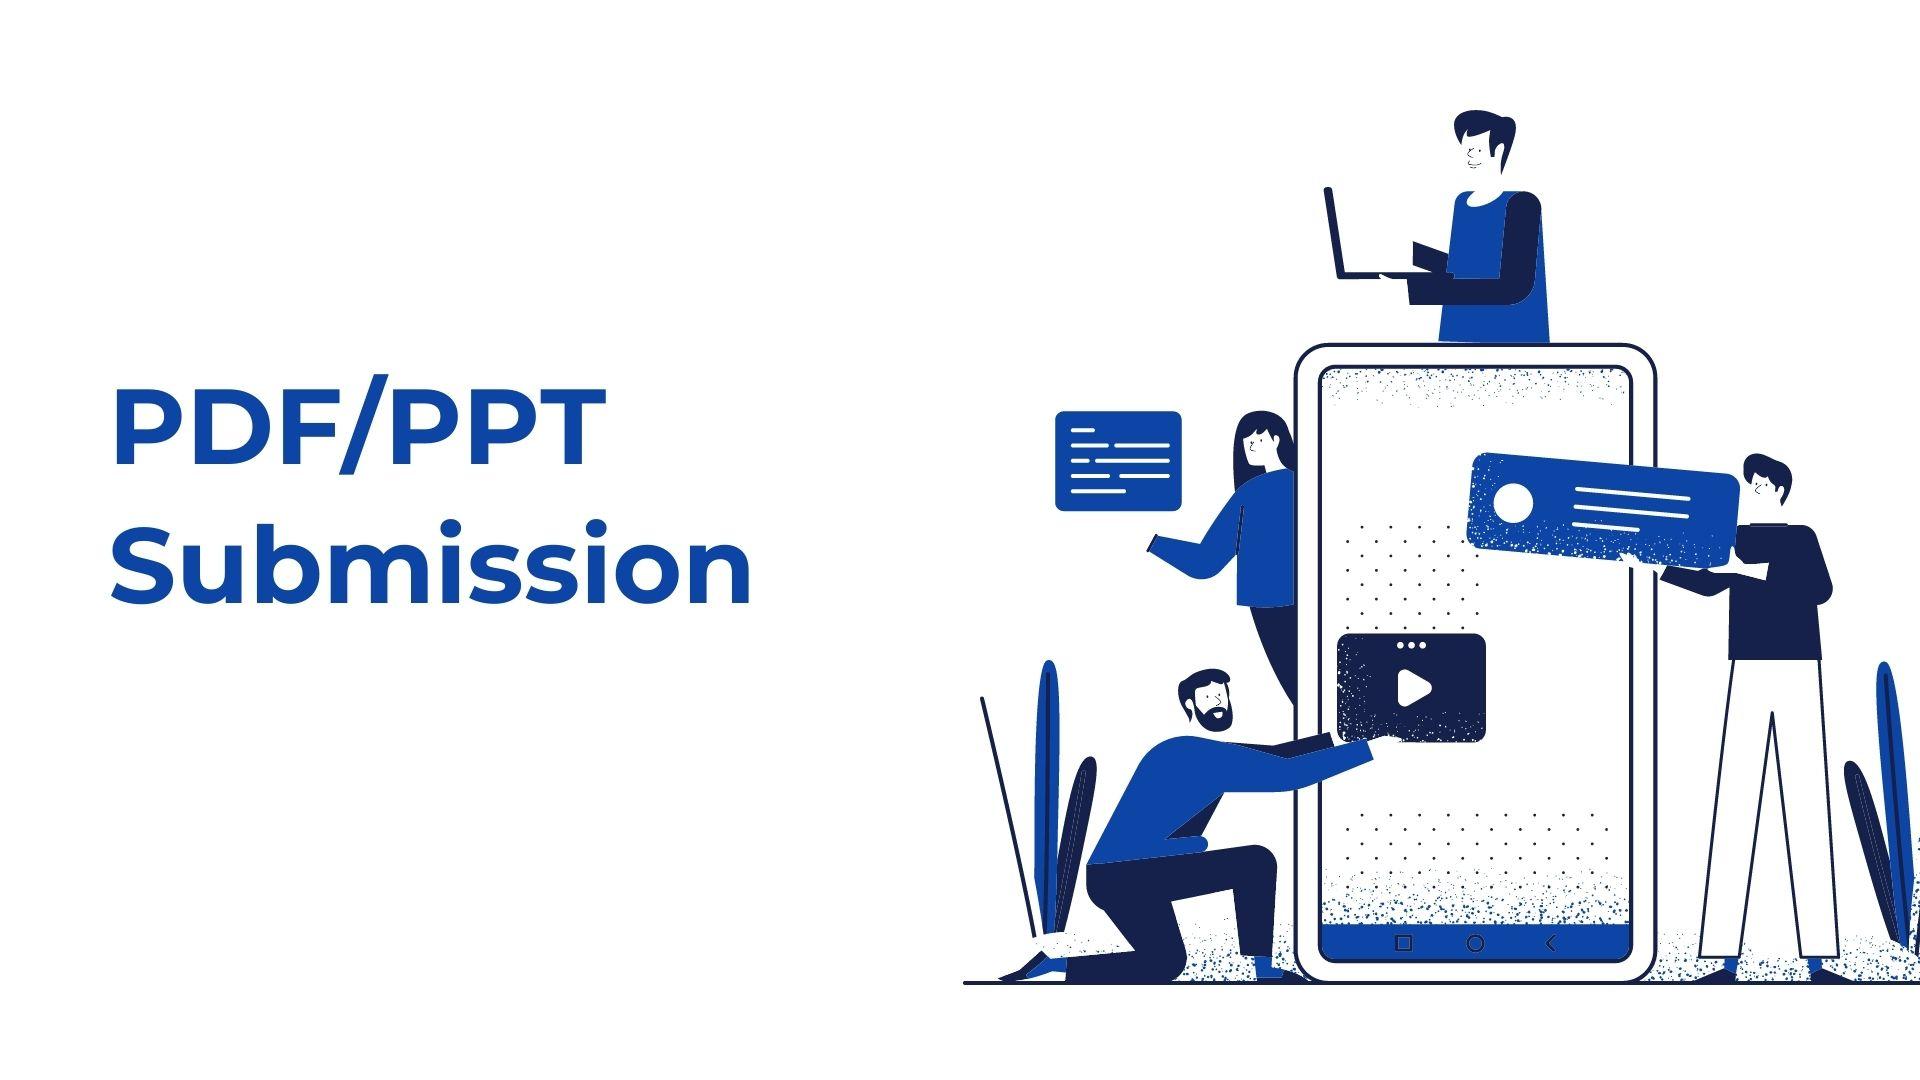 PPT PDF Submission - samblogger001